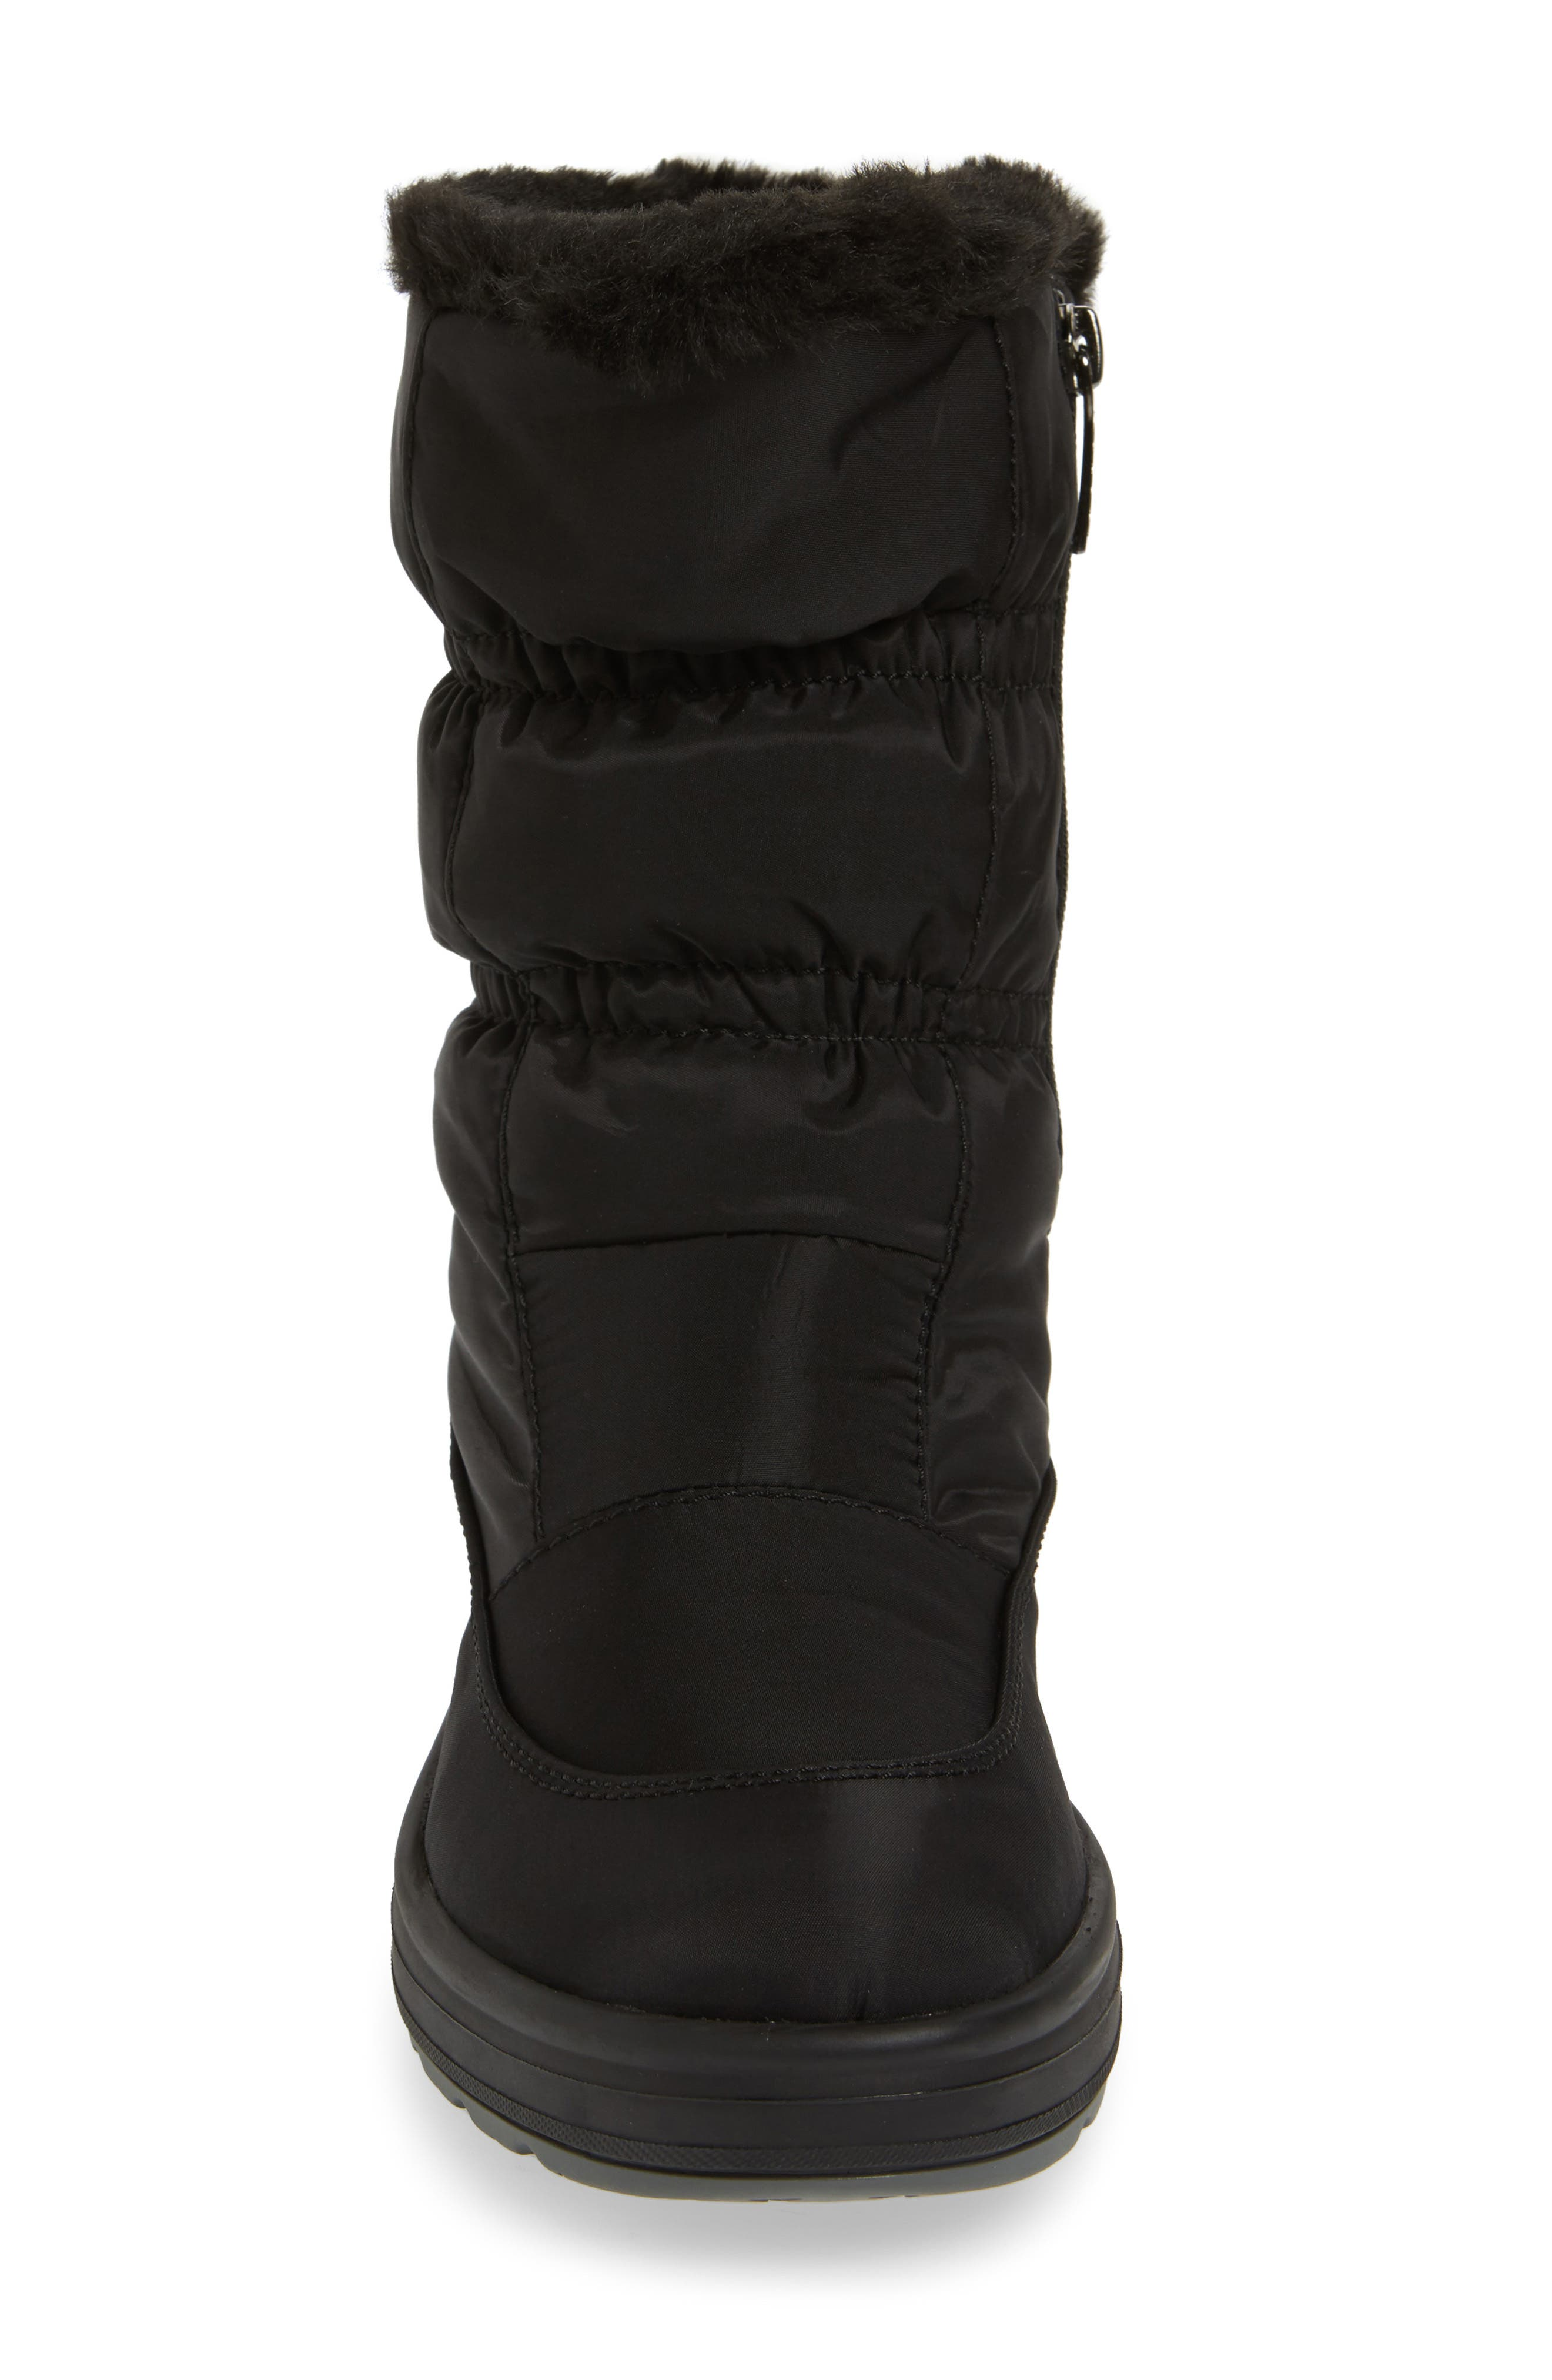 Snowcap Waterproof Insulated Winter Boot,                             Alternate thumbnail 4, color,                             BLACK FABRIC